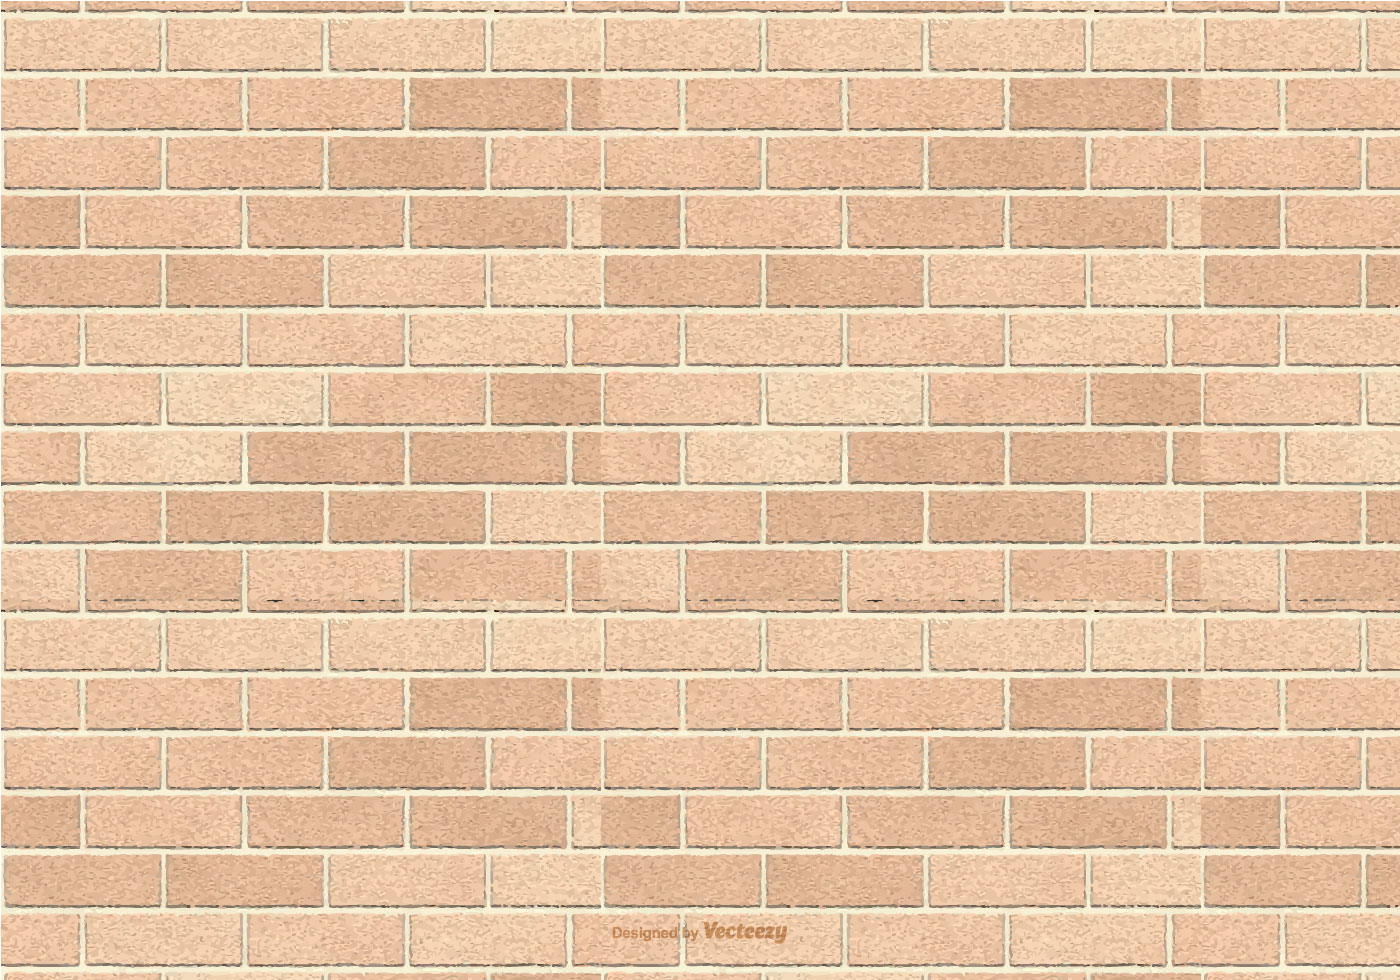 brick background 39 - photo #37